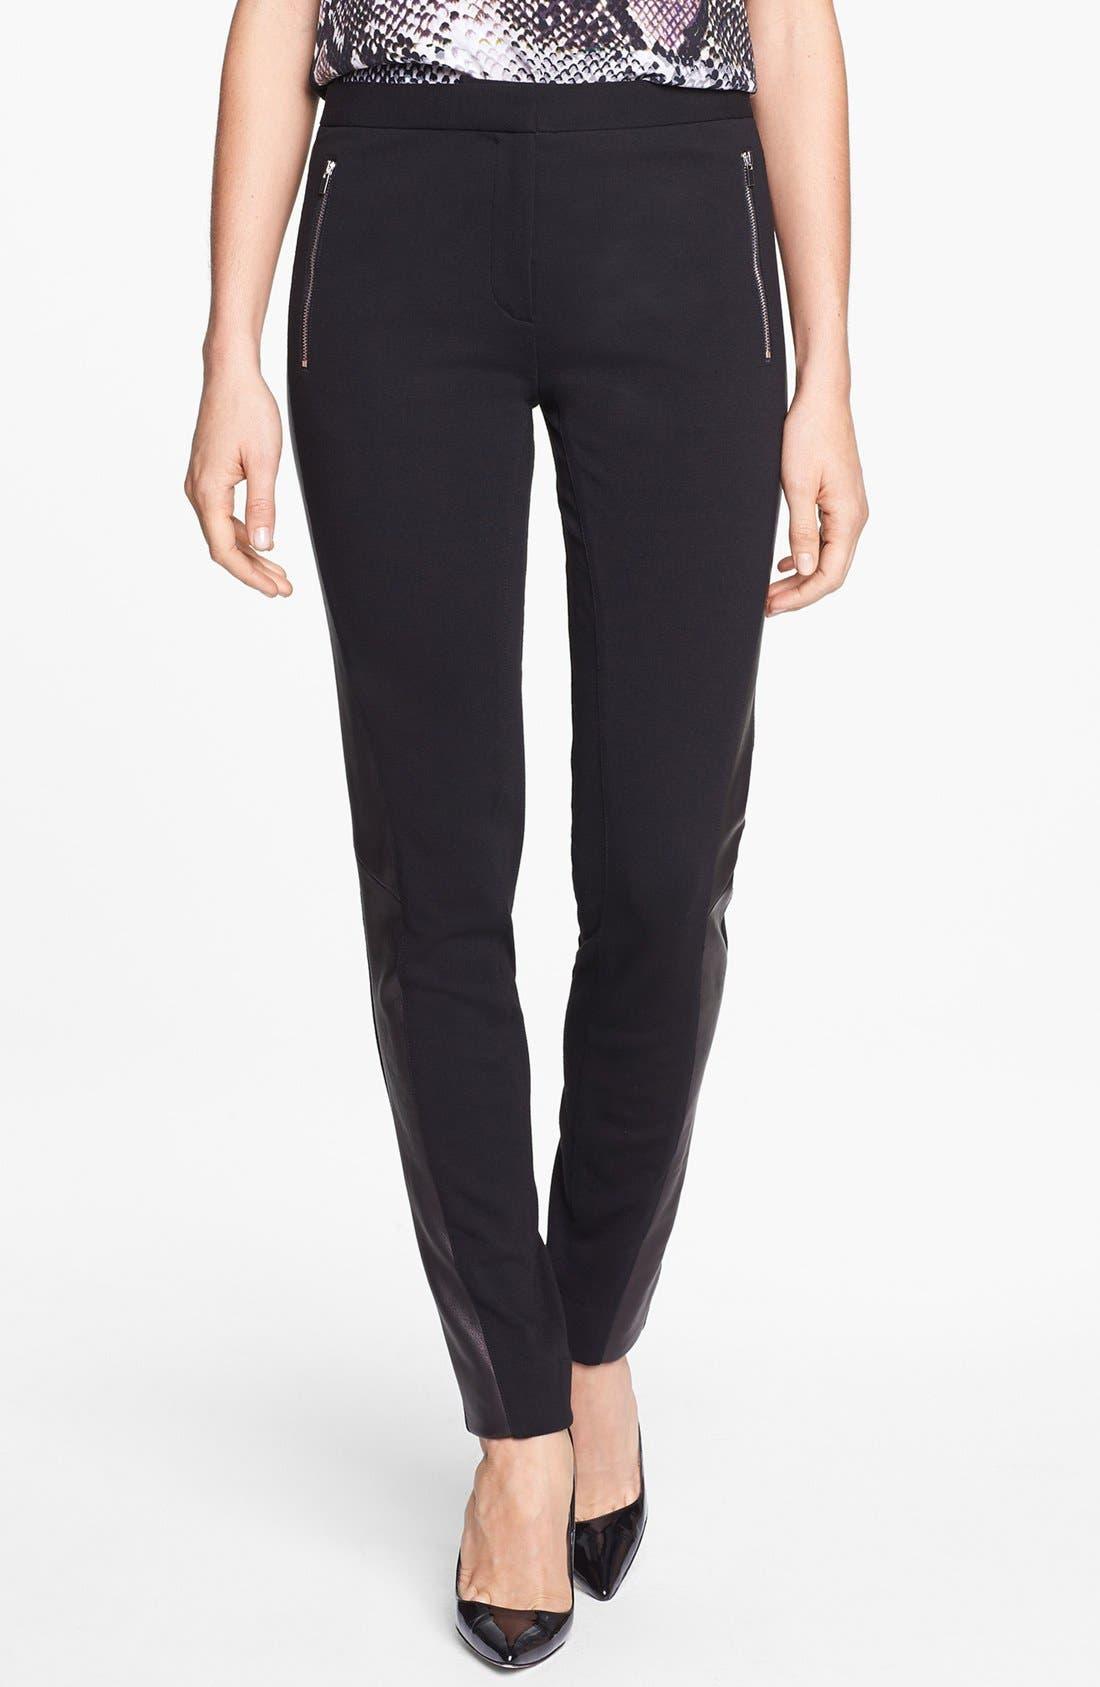 Main Image - Diane von Furstenberg 'Leah' Leather & Pont Pants